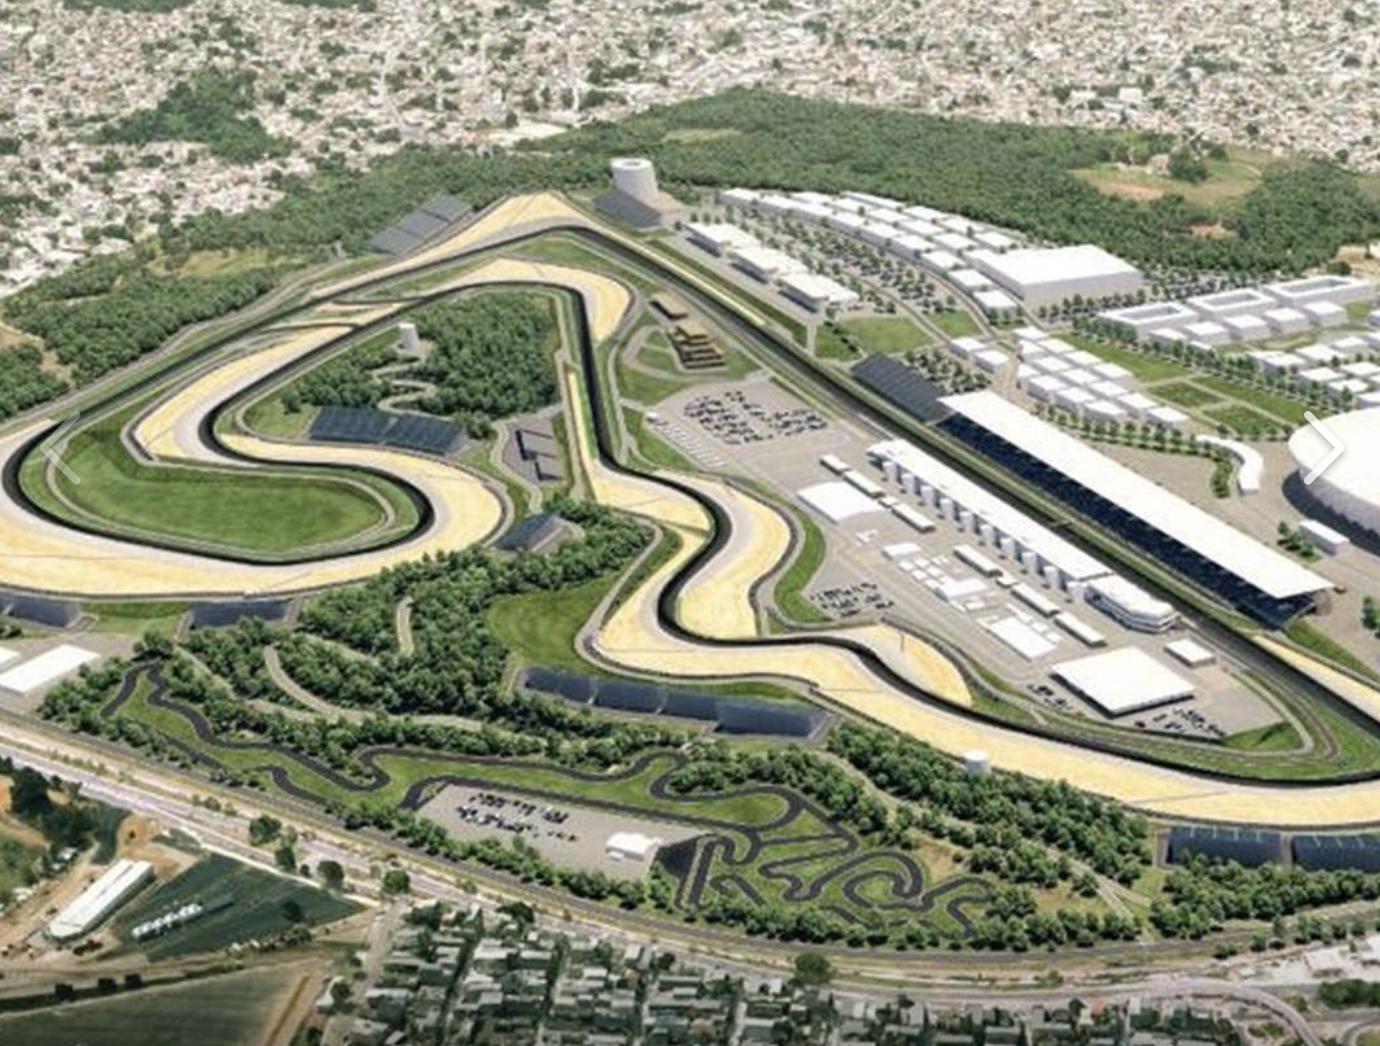 Motogp Calendar 2022.Brazil Returns To Motogp Calendar In 2022 At All New Ri Visordown